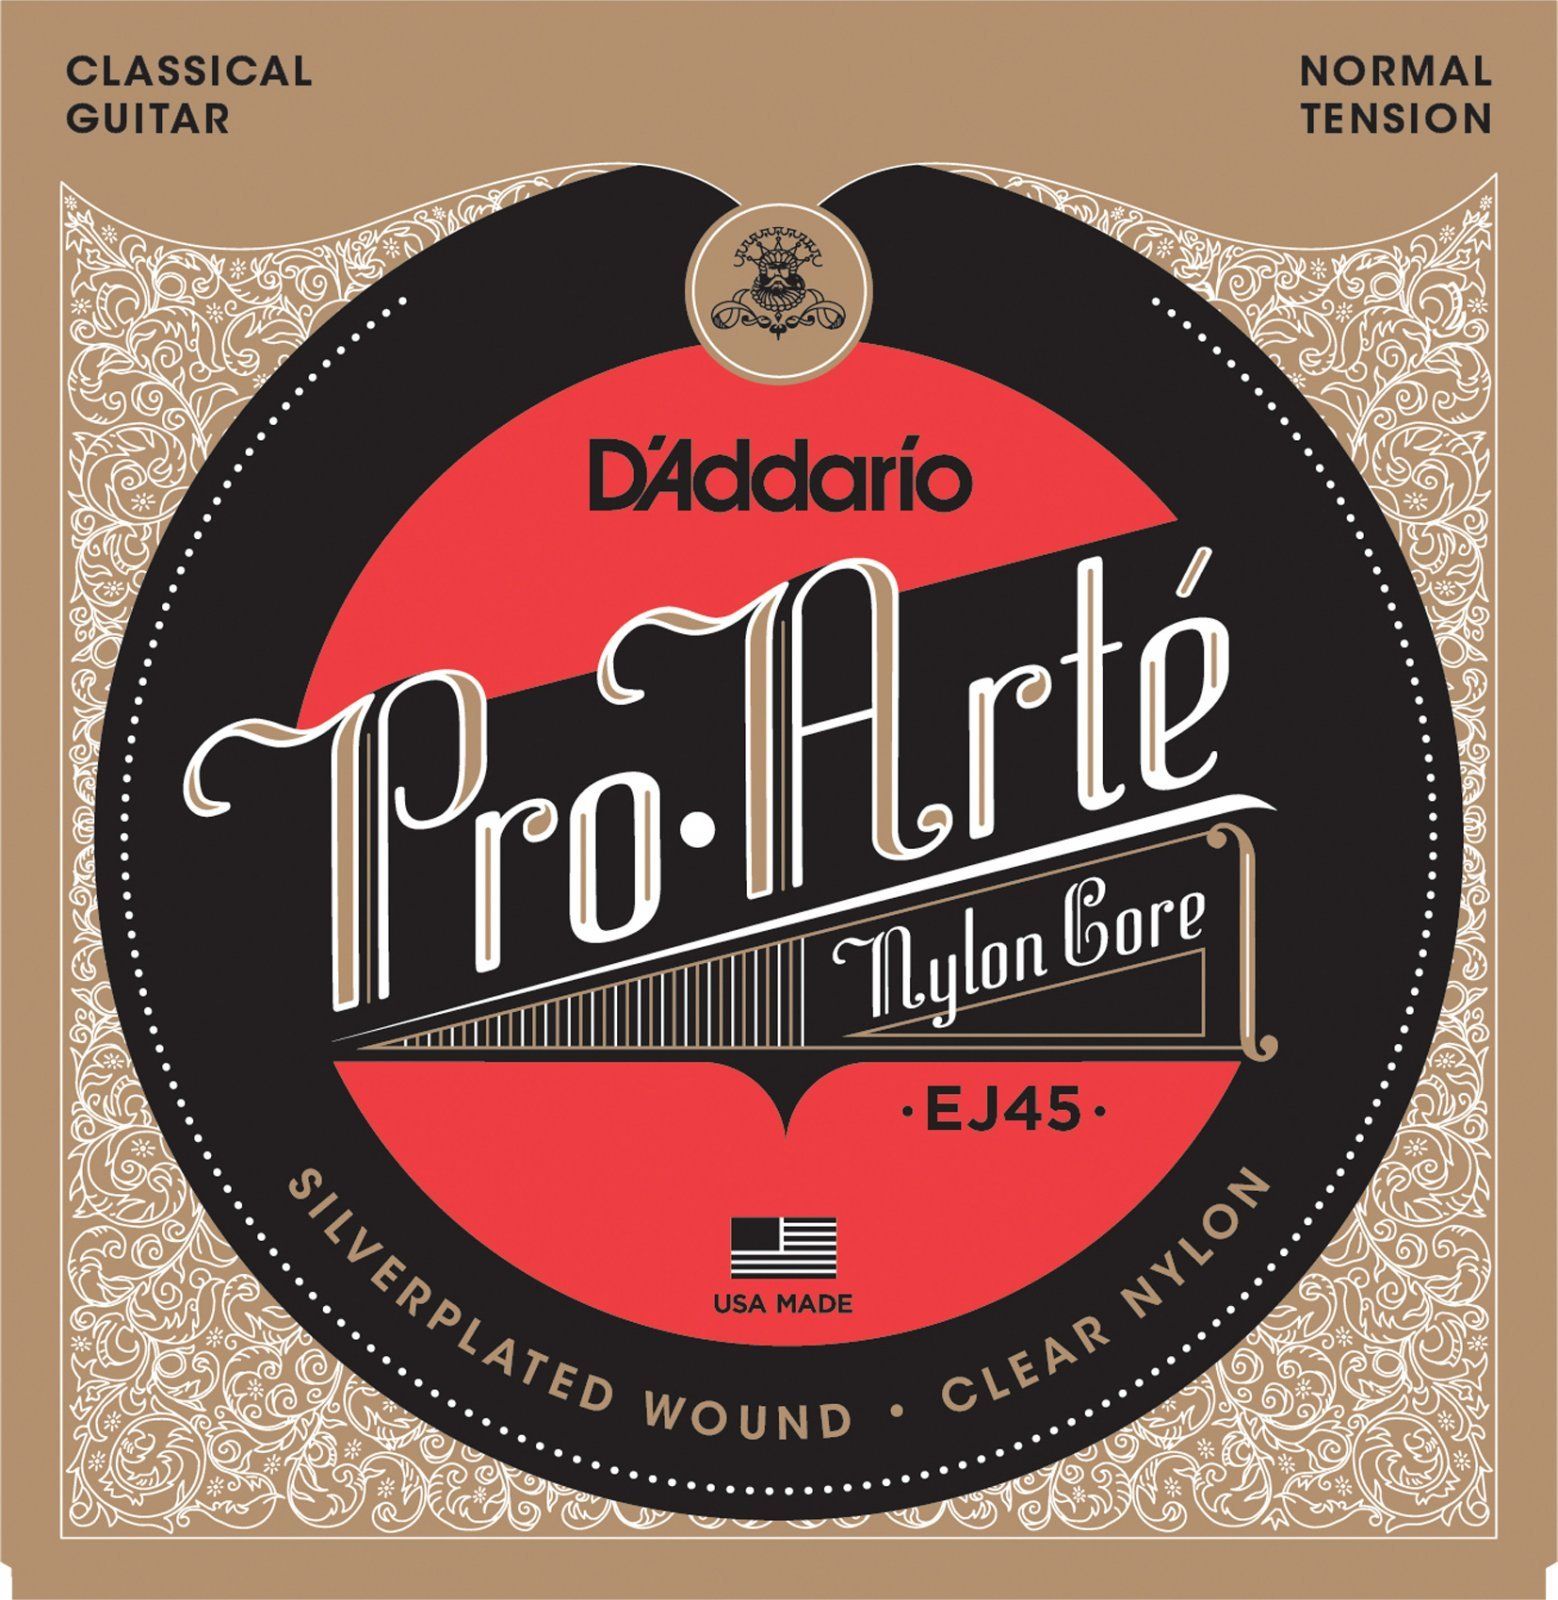 D'addario Pro Arte Nylon Core Classical Guitar Strings